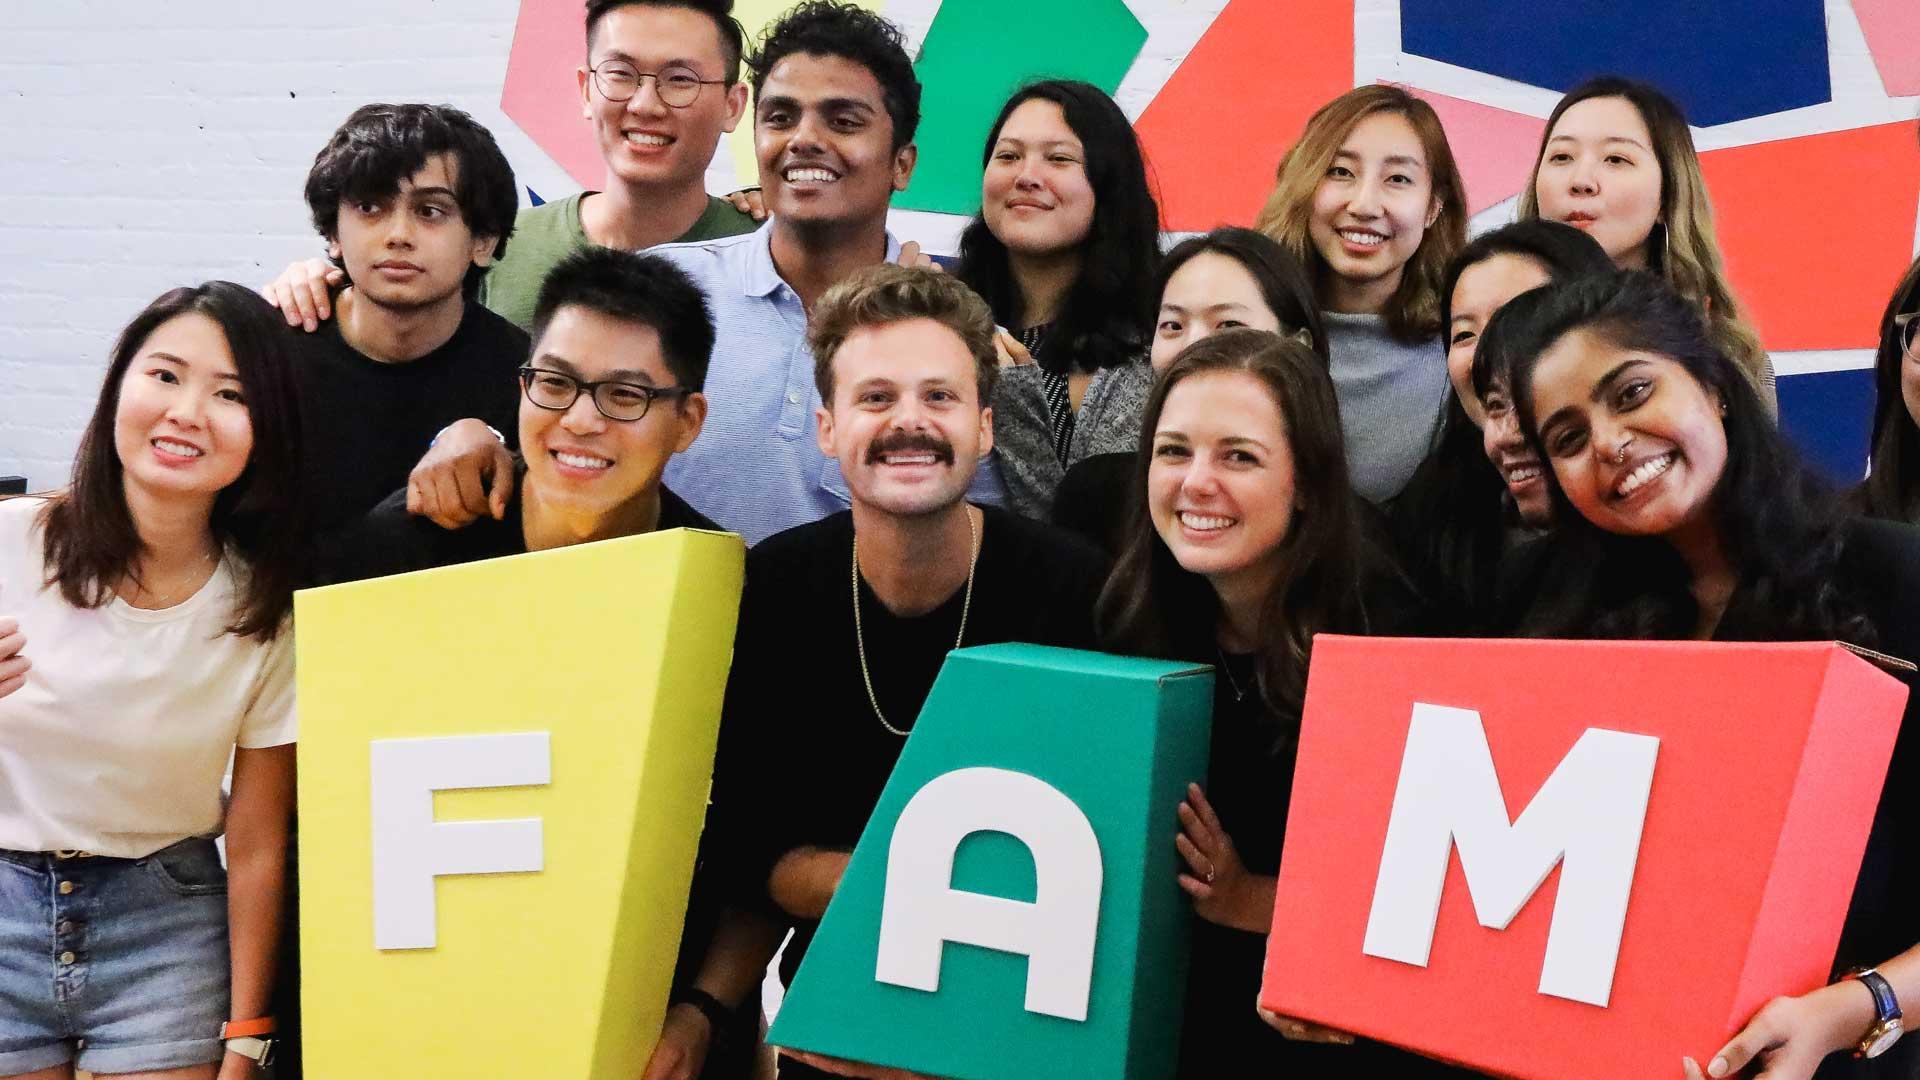 MFA Design students holding FAM